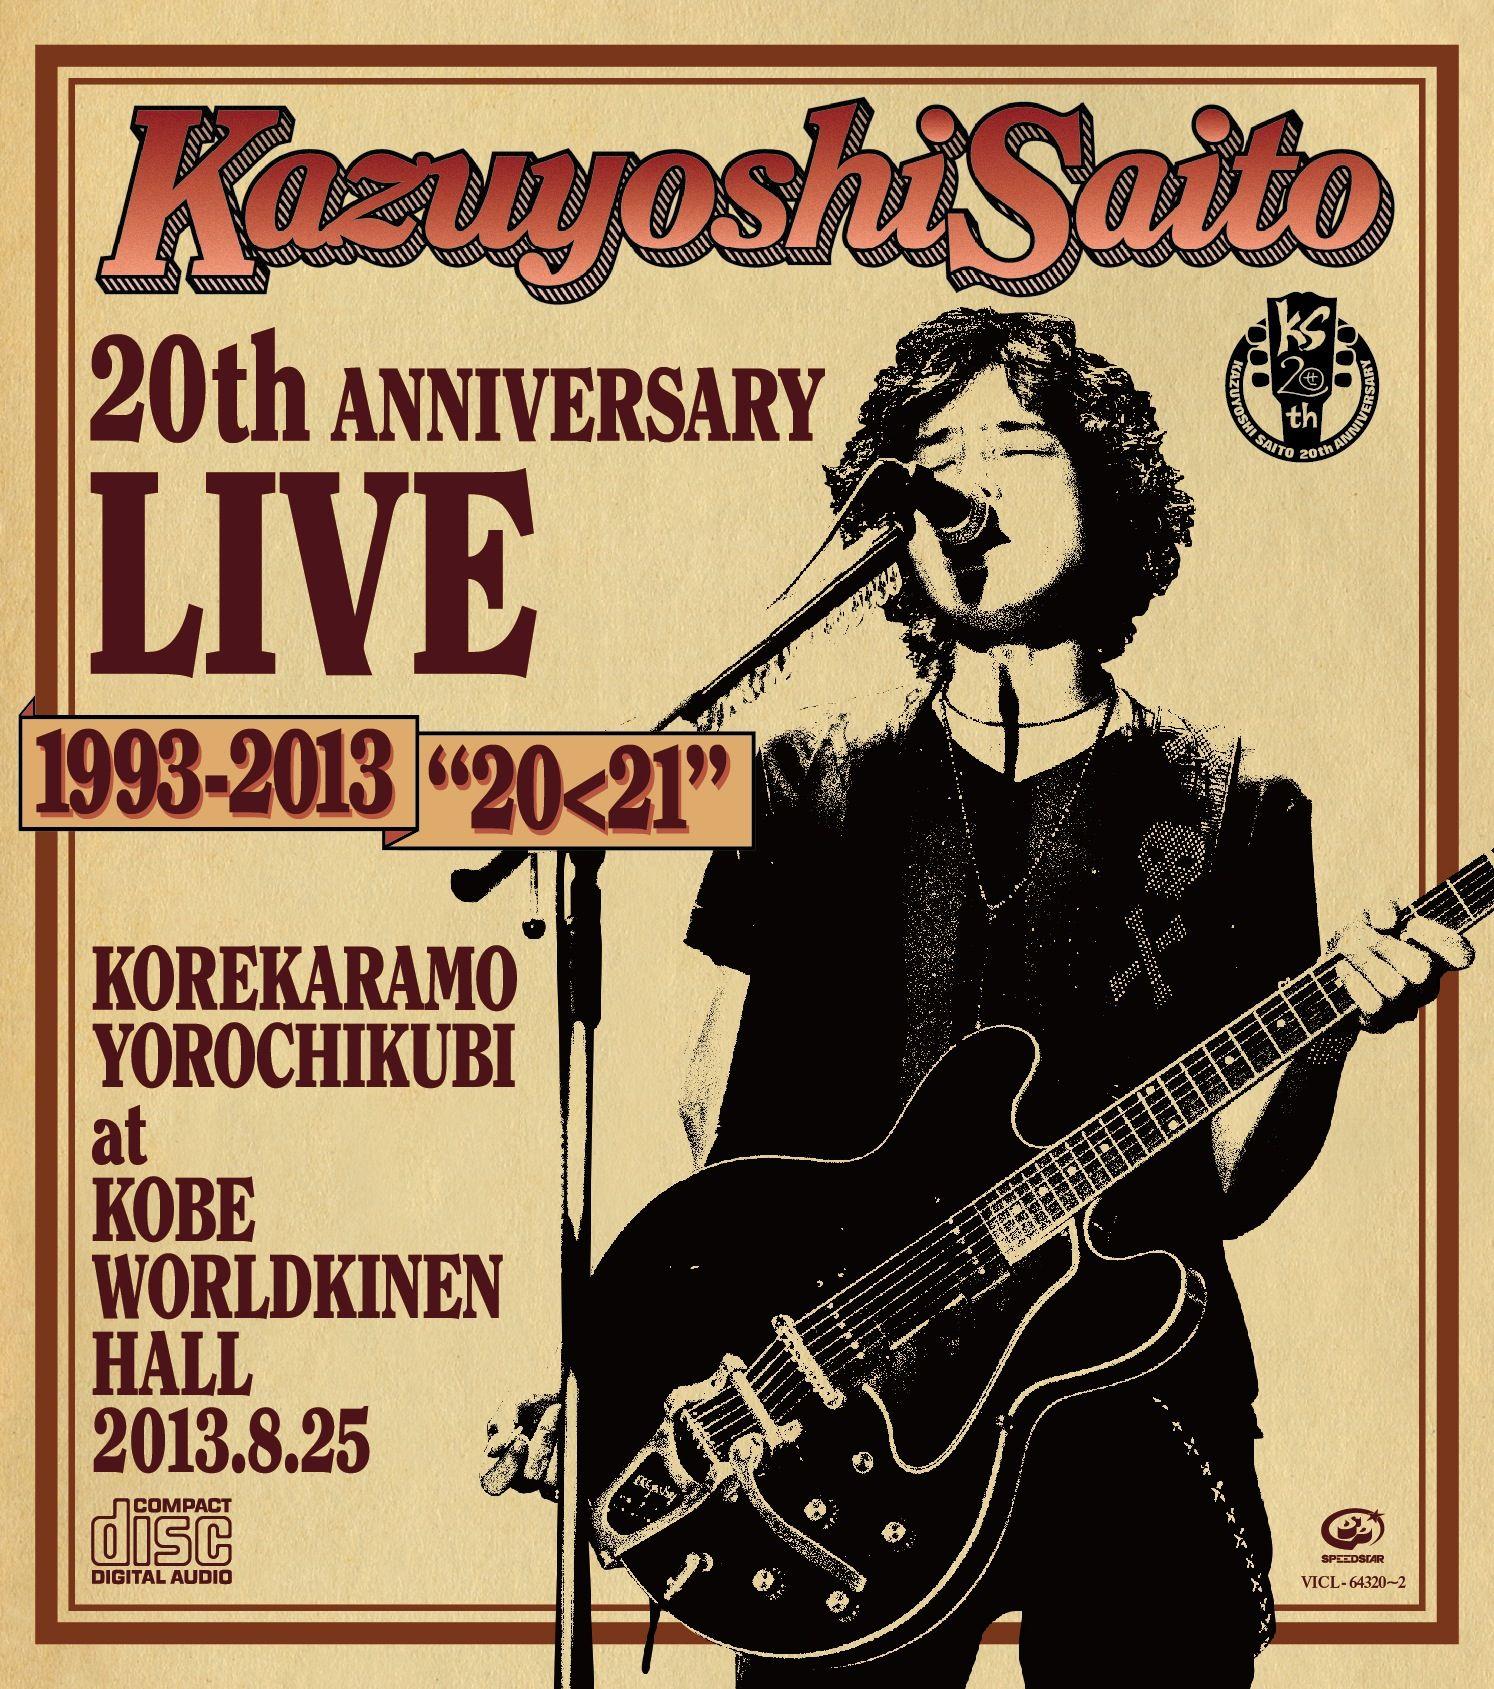 "『Kazuyoshi Saito 20th Anniversary Live 1993-2013 ""20<21"" ~これからもヨロチクビ~ at 神戸ワールド記念ホール 2013.8.25』jacket"